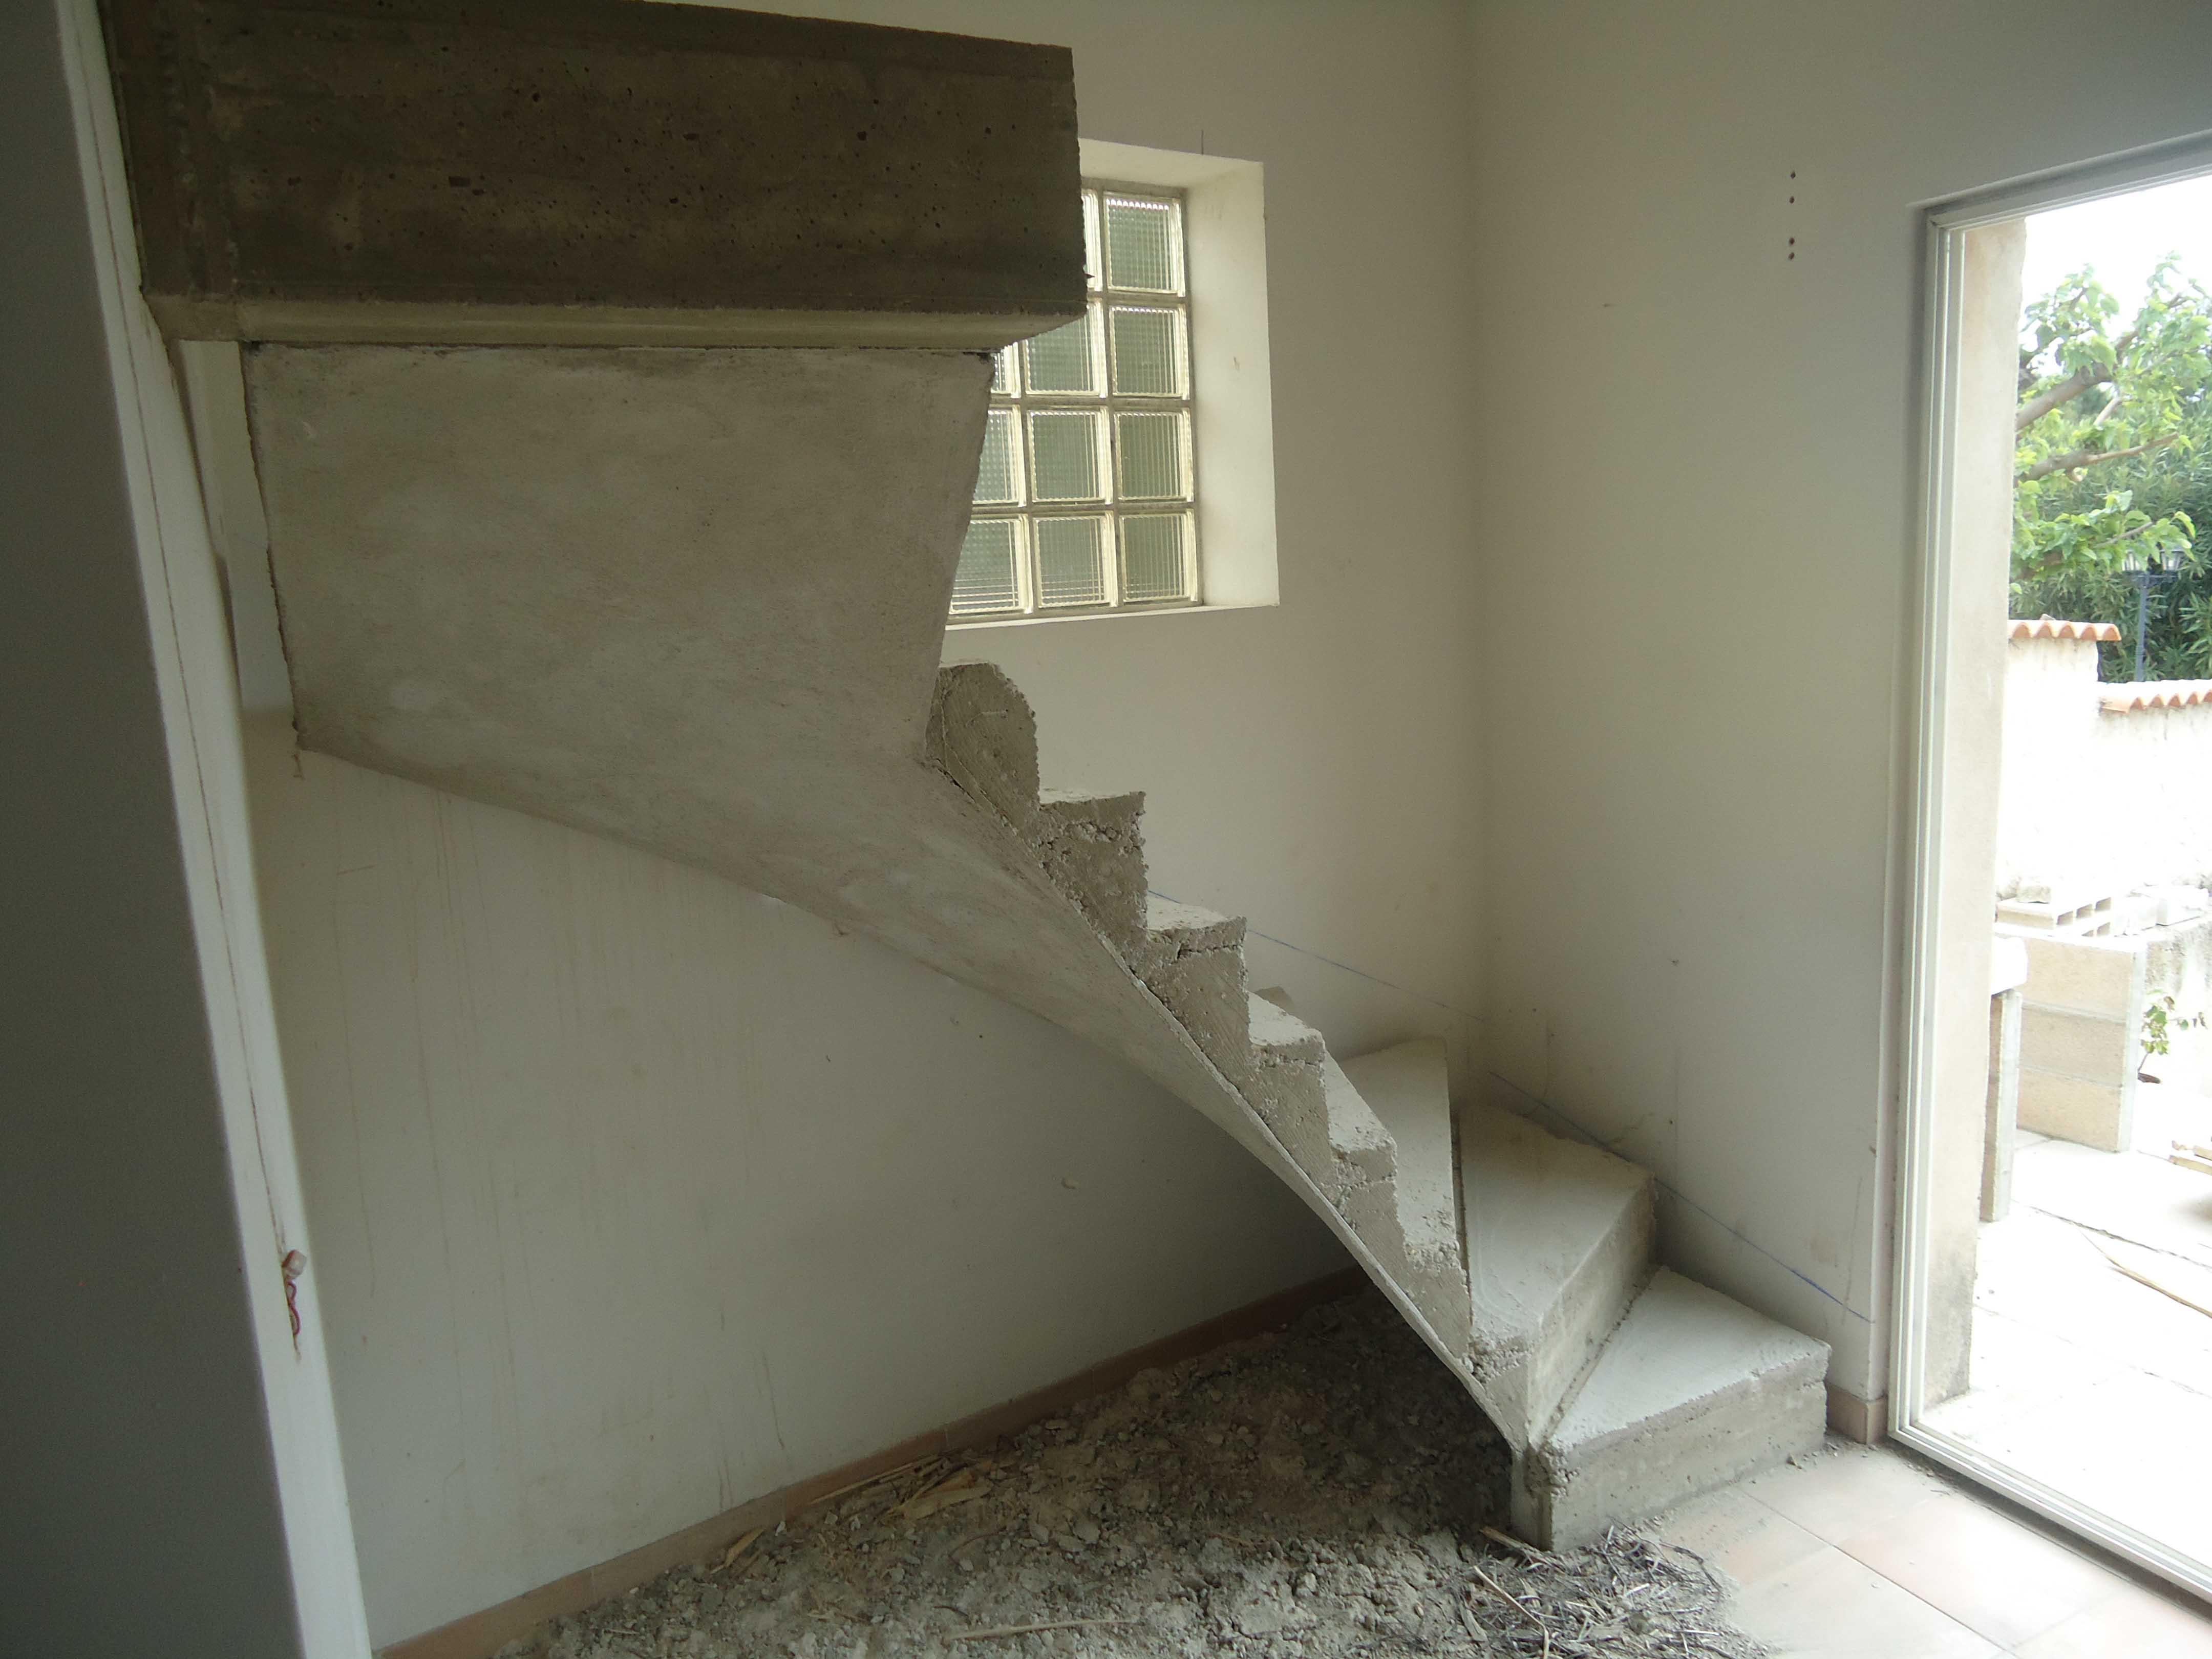 Escalier Beton Exterieur Prix saëzcalier - fabricant d'escalier